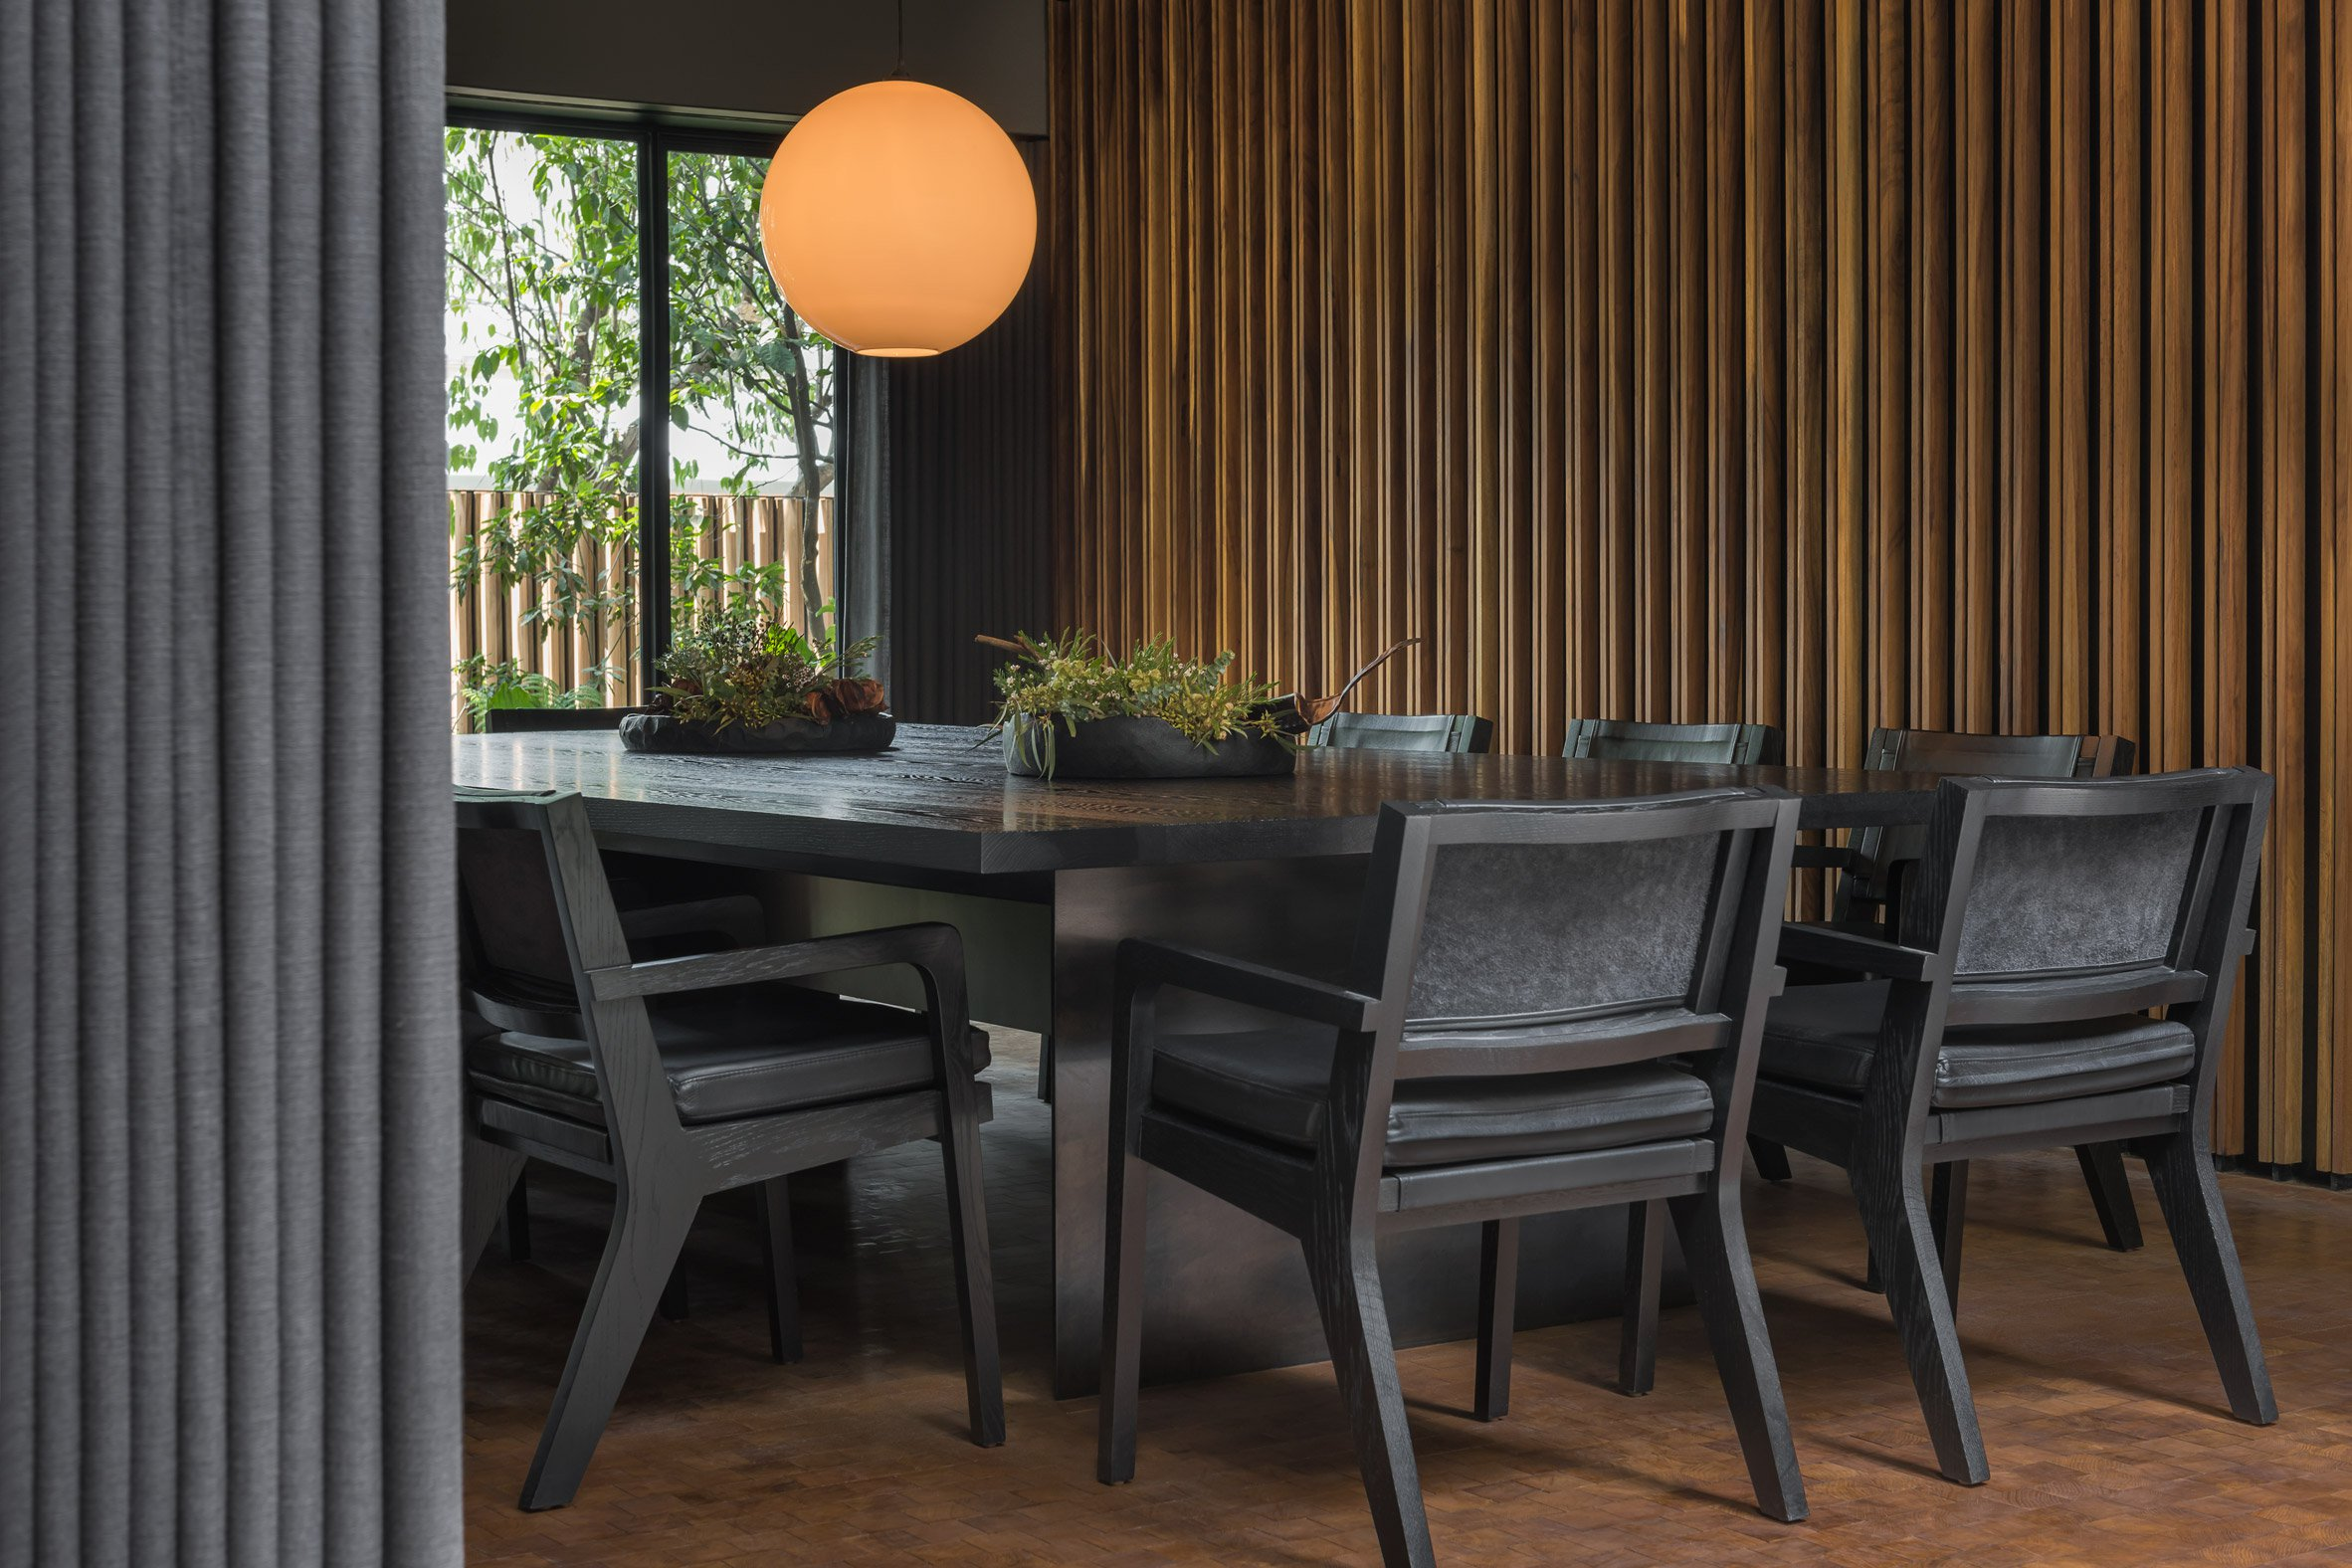 architecture-pujol-restaurant-interiors-design-studia-osnovadesign-osnova-poltava_04